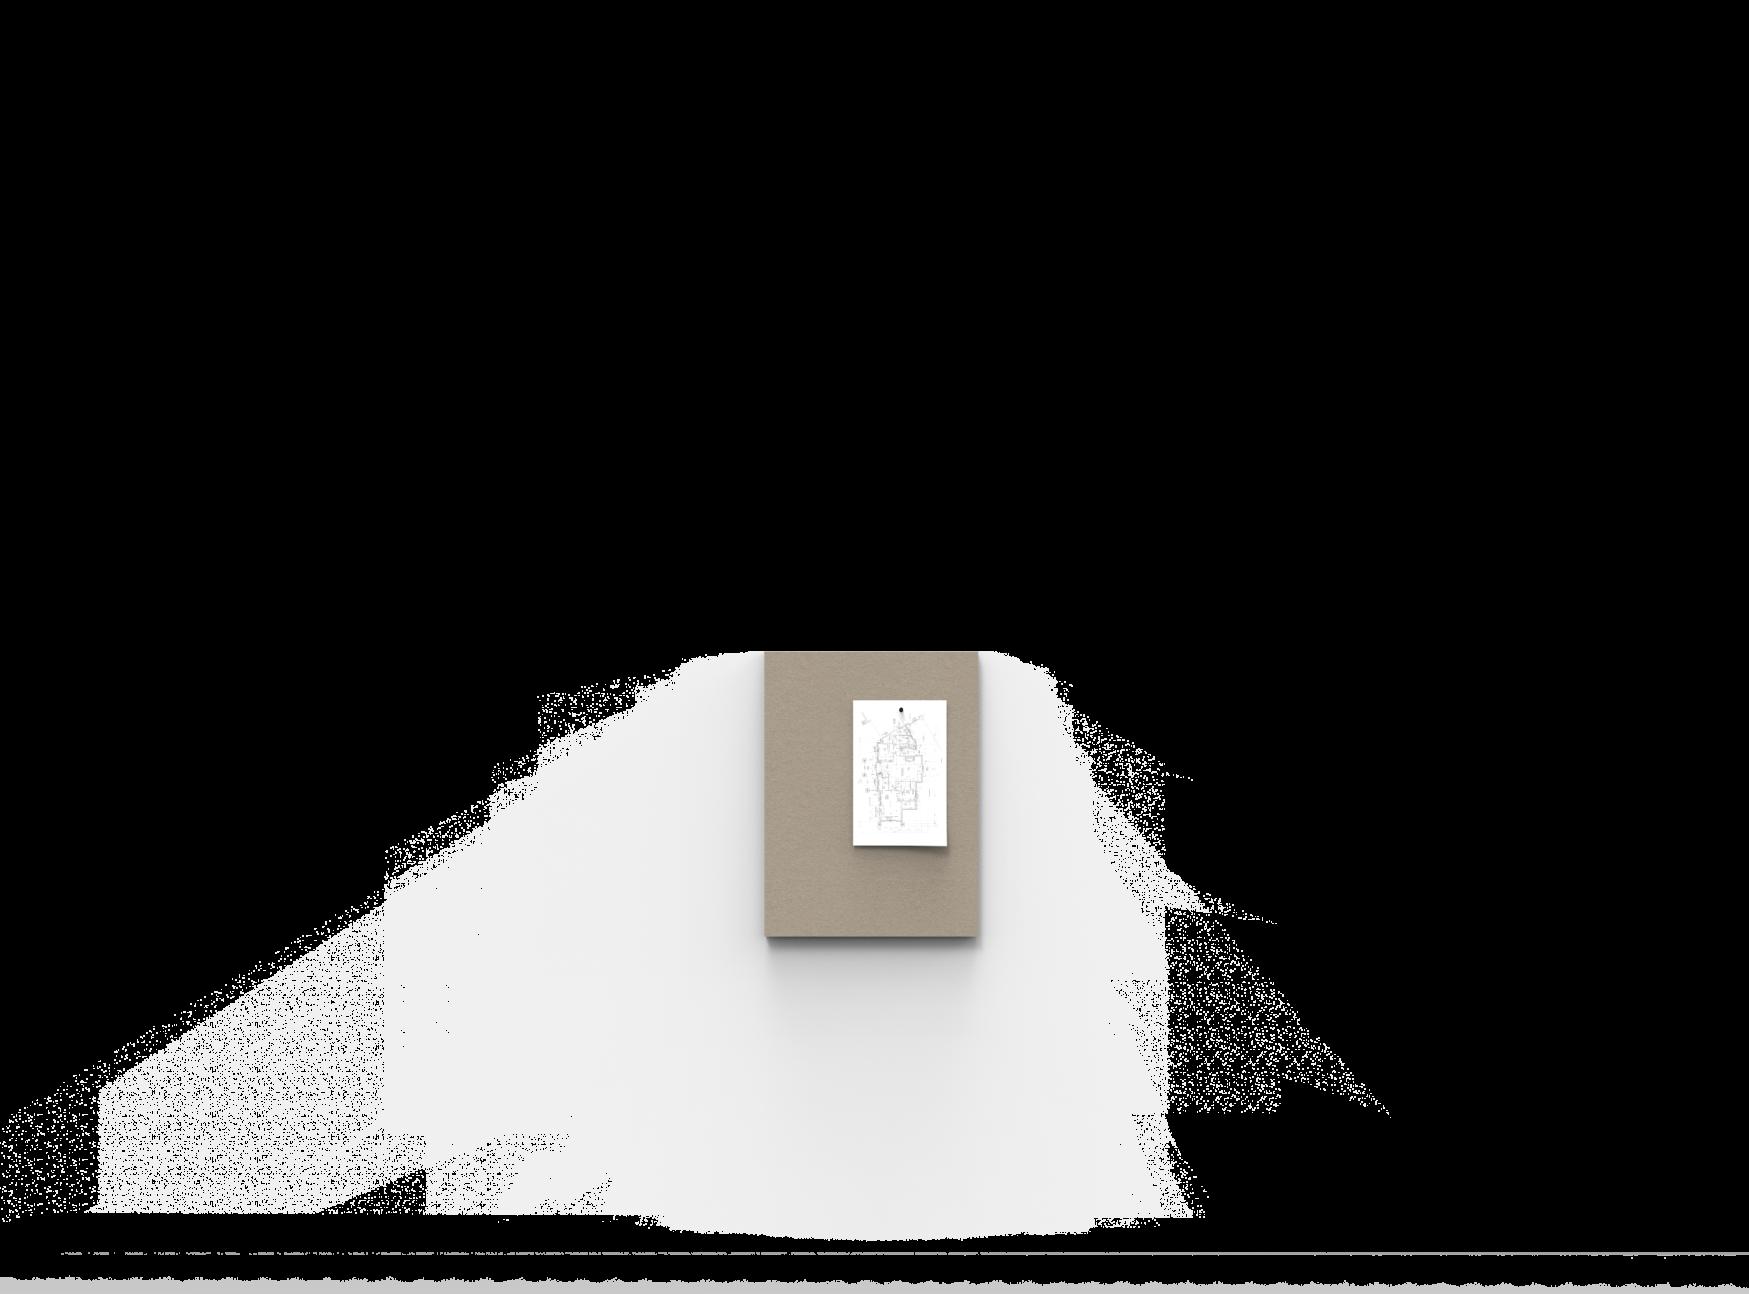 445 x 595